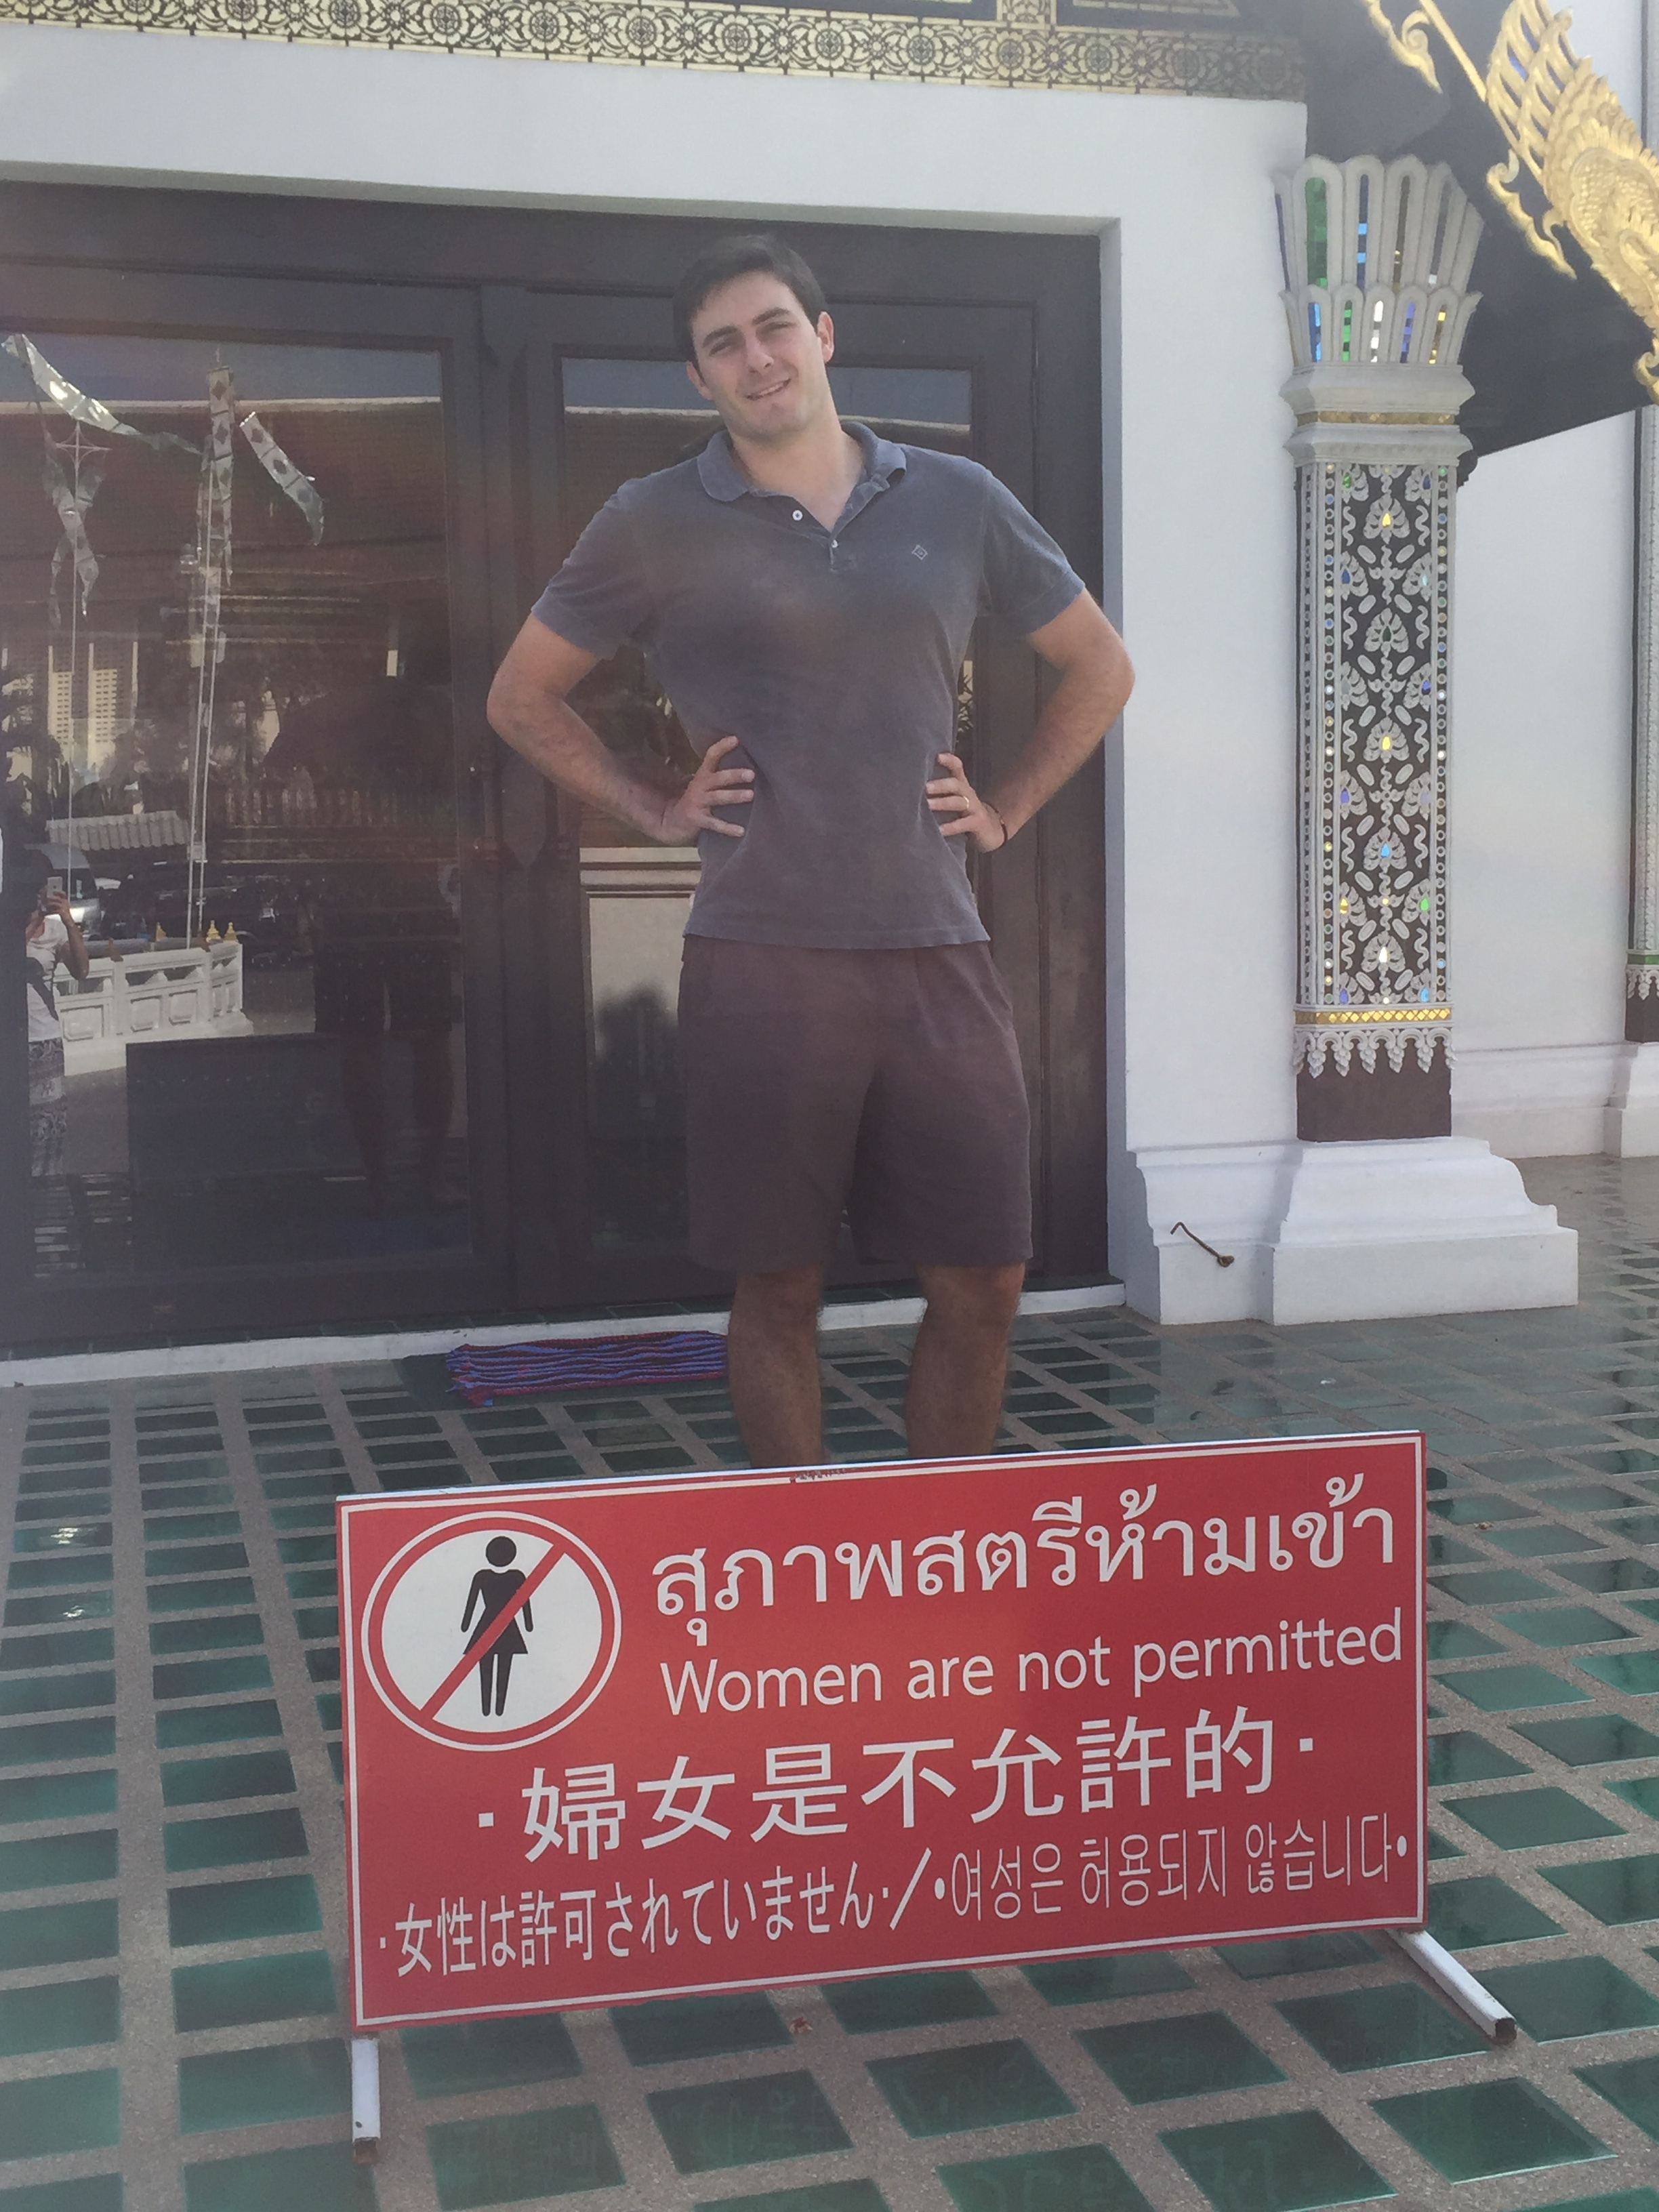 No girls allowed!